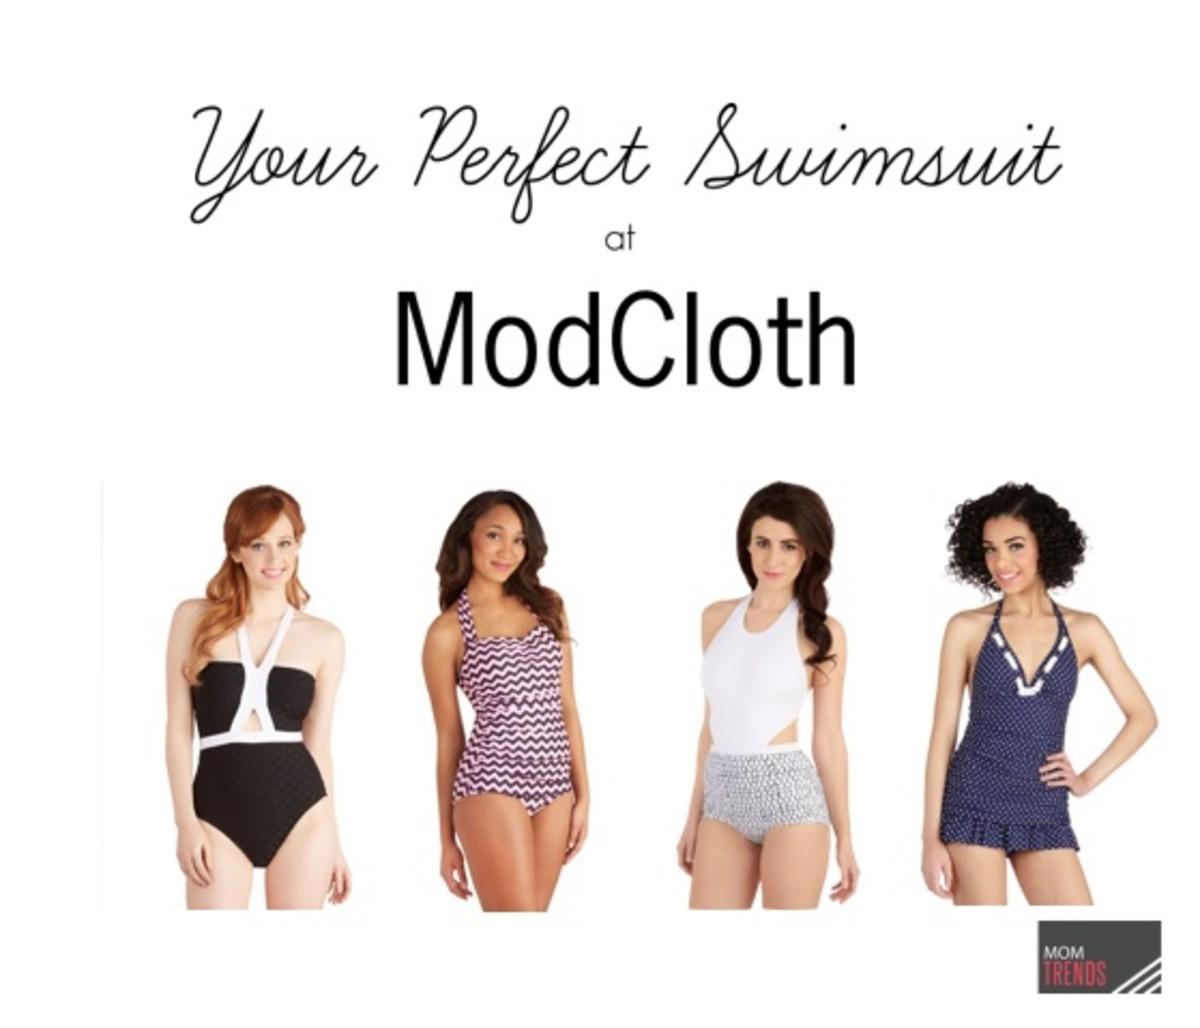 ModCloth Swimsuit